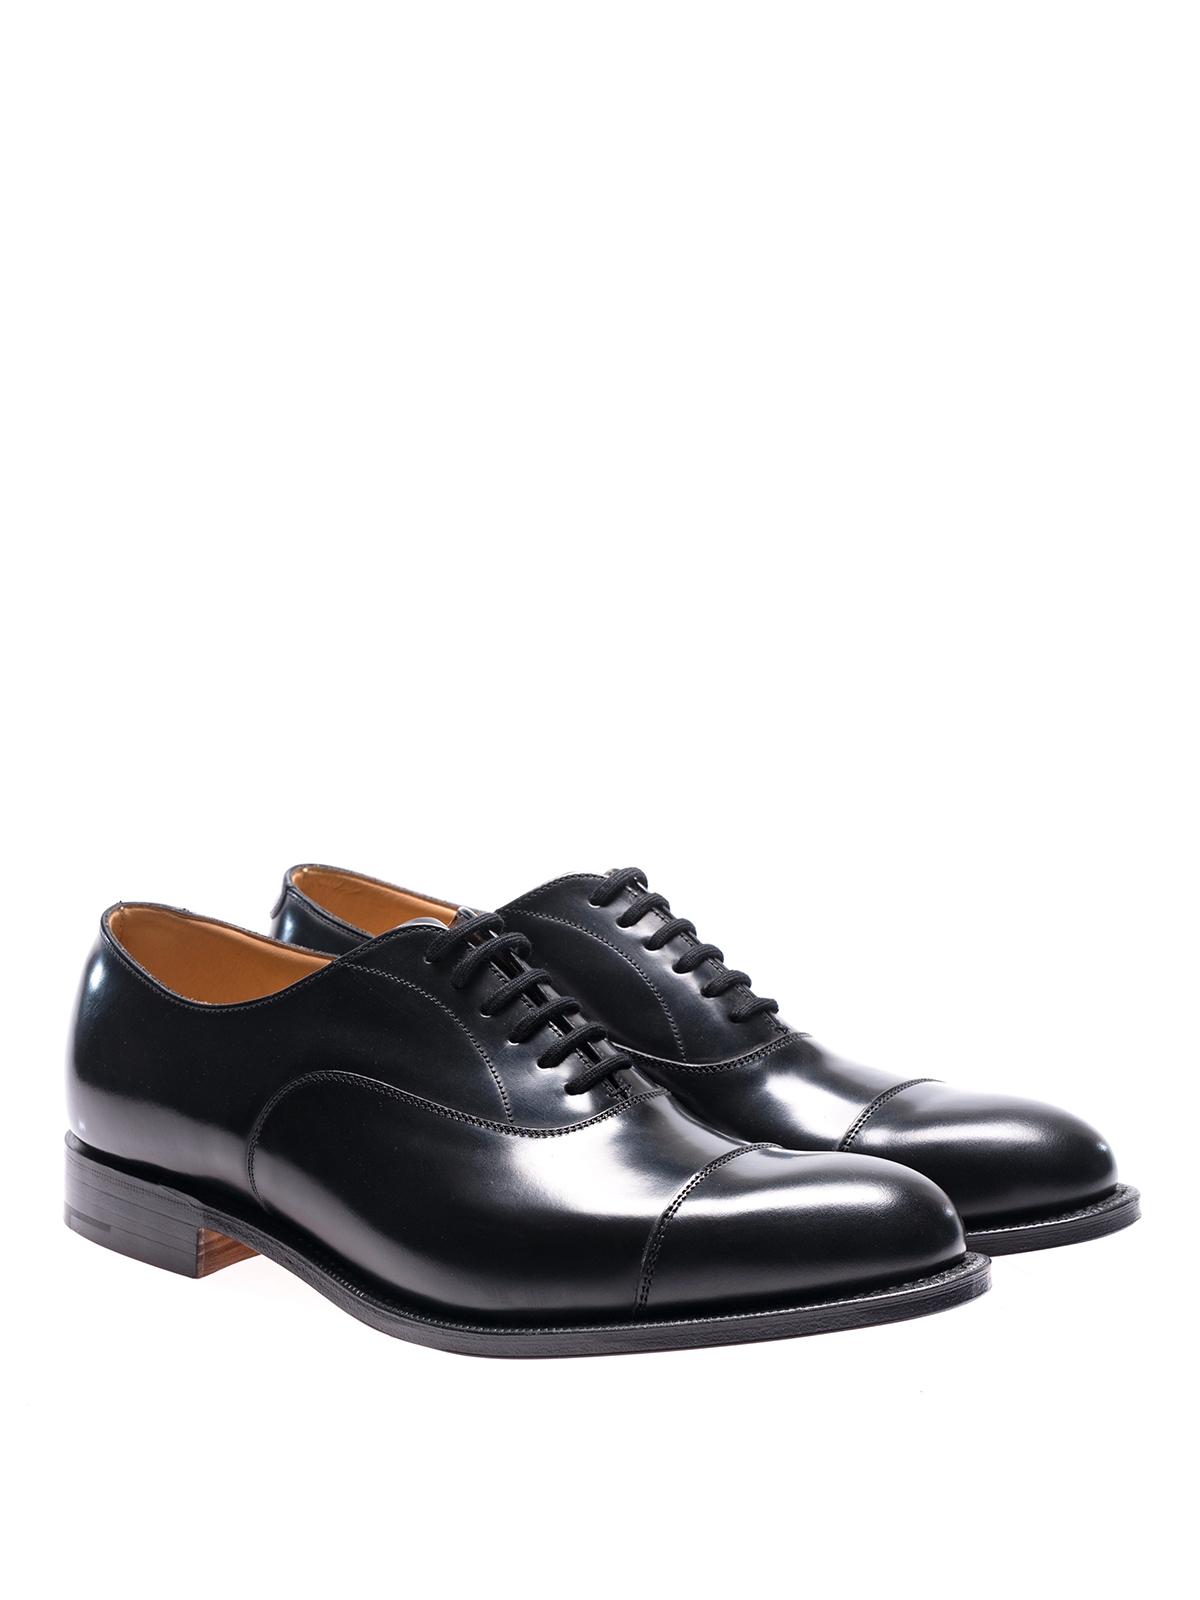 b9f47ed54b3 Dubai black leather Oxford shoes shop online  CHURCH. CHURCH. CHURCH. CHURCH